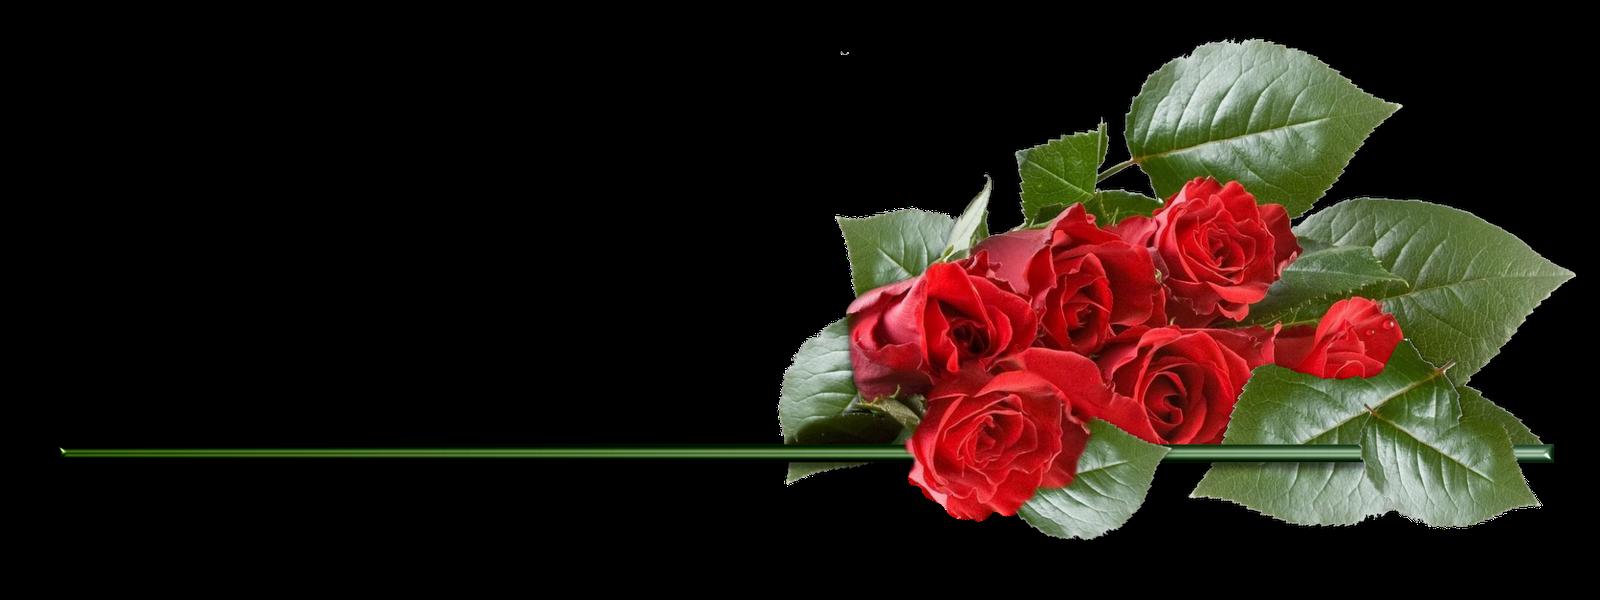 ... clip art ribbon letter font b spring flowers clip art tulips images of